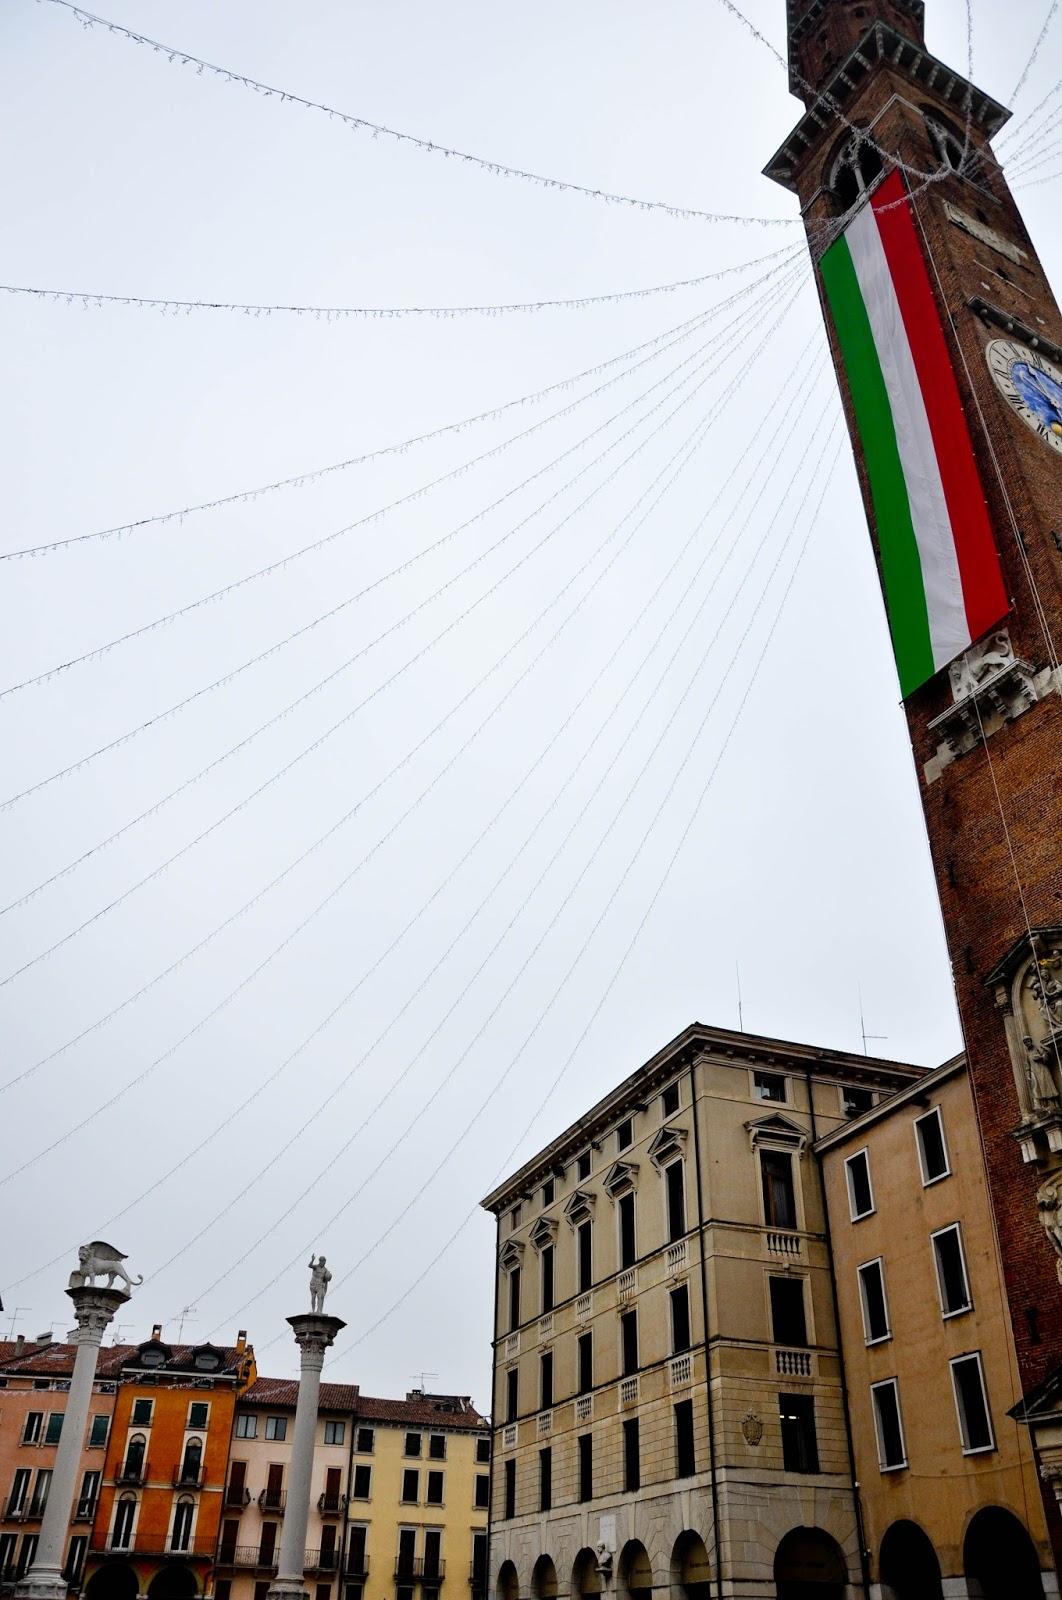 Piazza dei Signori with the Italian flag, Saint Barbara celebration, Vicenza, Veneto, Italy